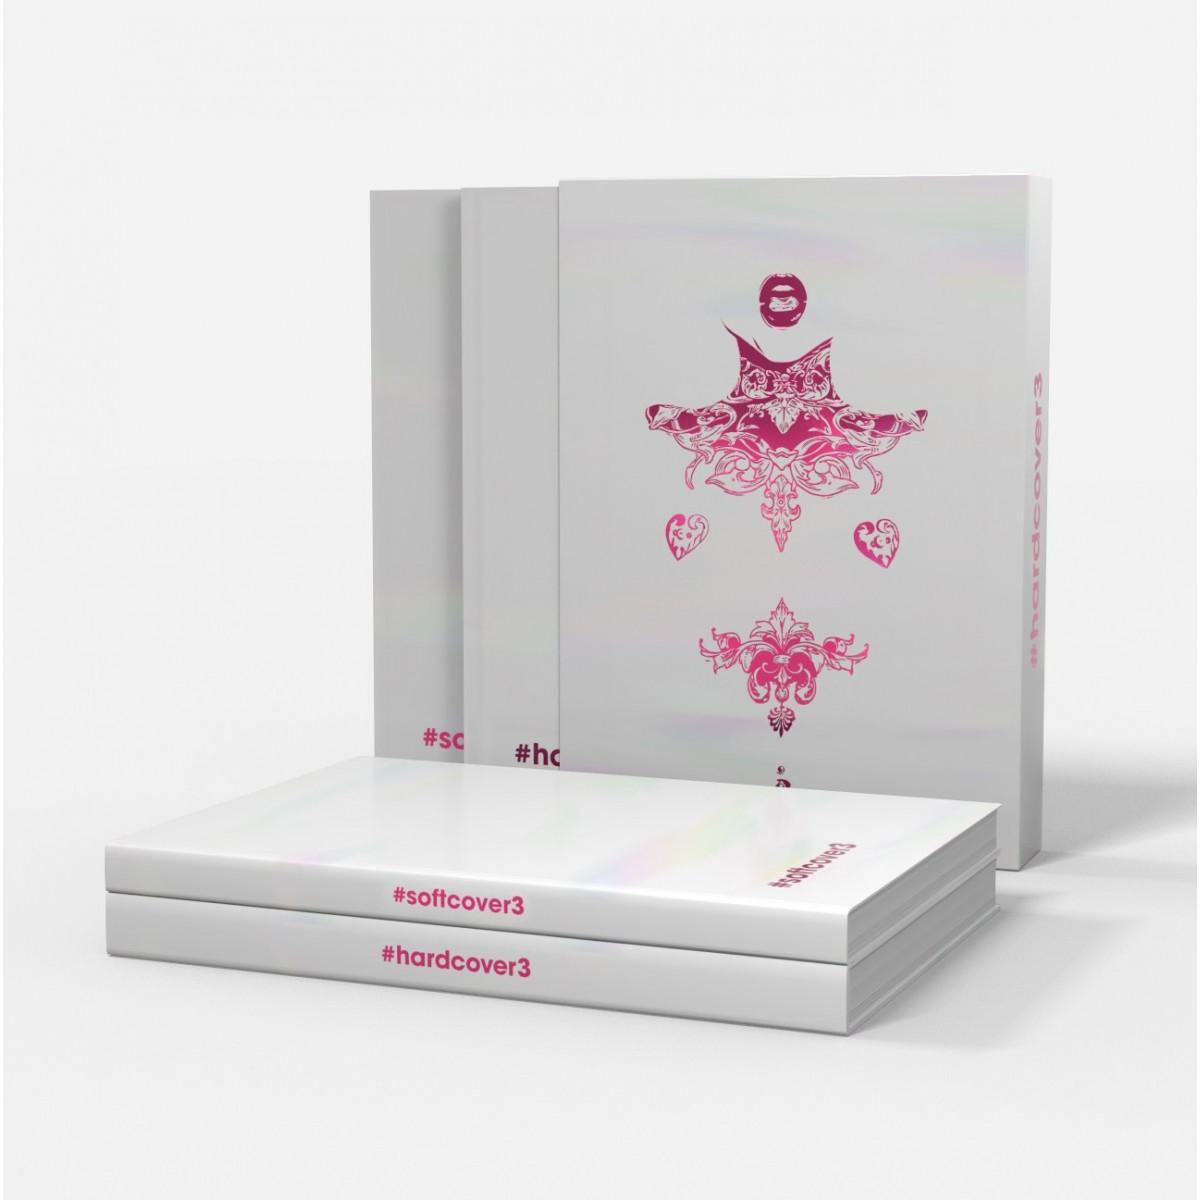 Hardcover 3 - Slipcase